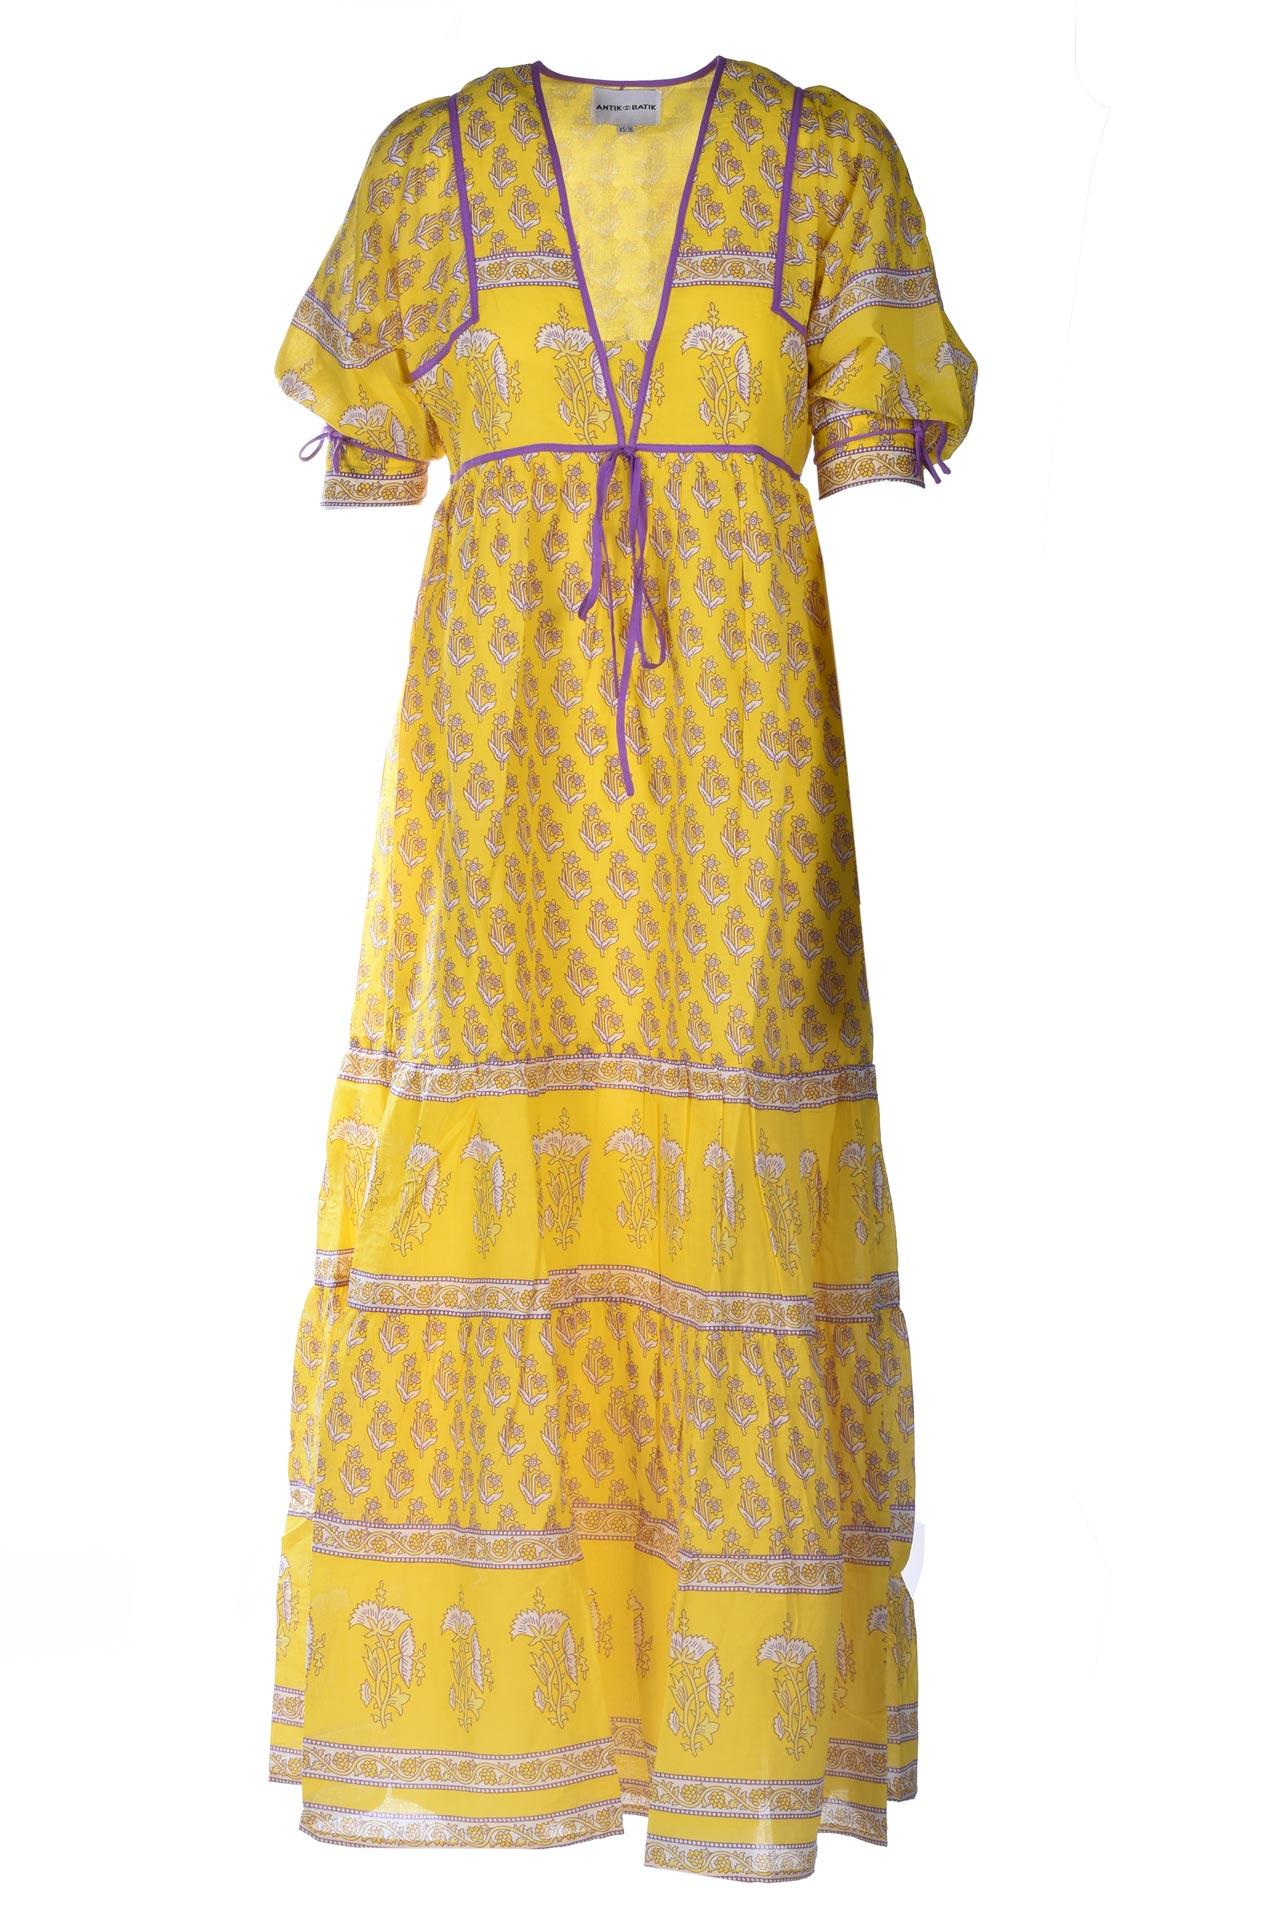 Empire cut maxi dress in yellow cotton voile ANTIK BATIK |  | MORI1LDRYELLOW